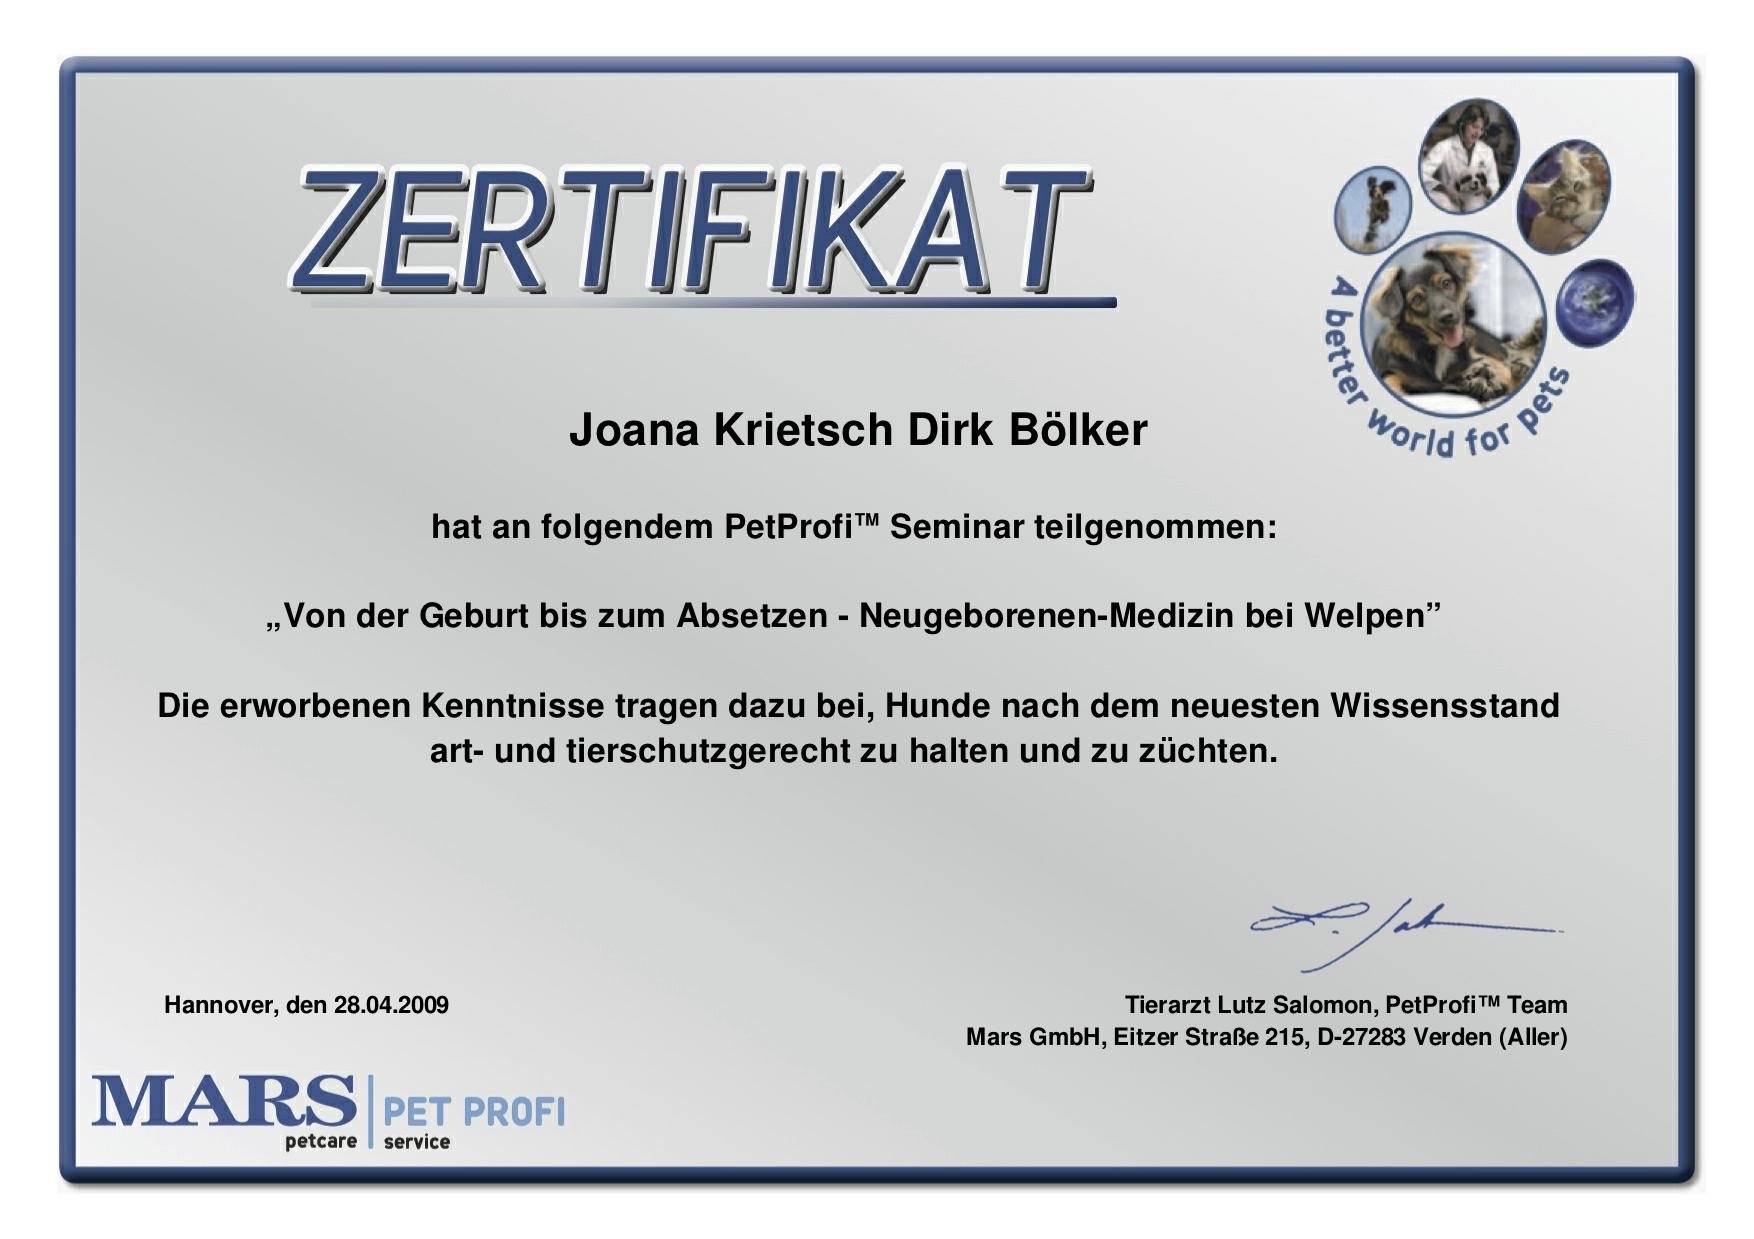 20180605-124931_Zertifikat